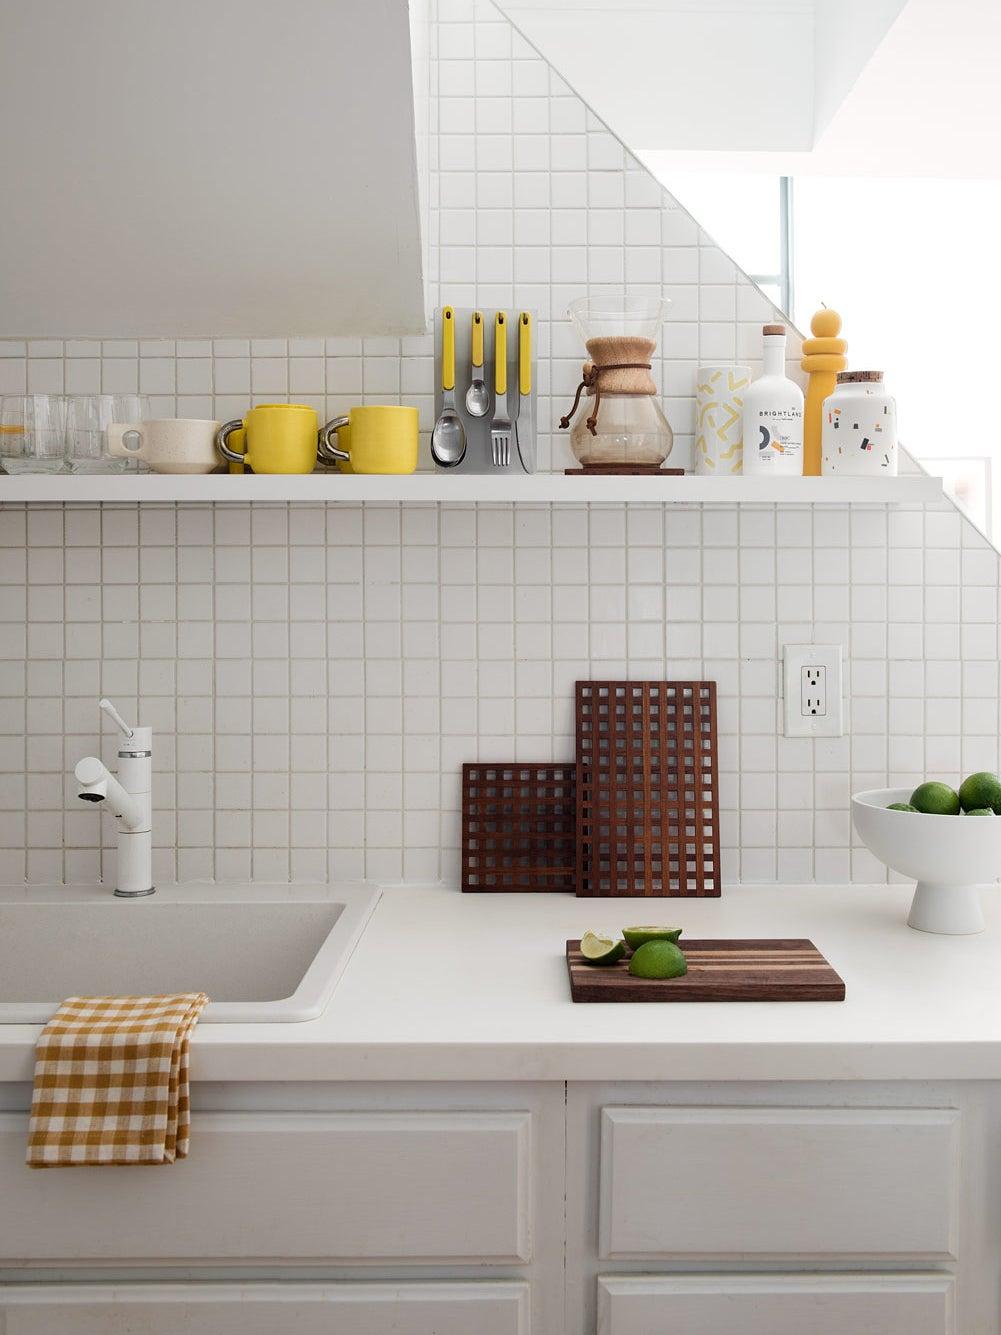 White kitchen counter with white shelf above